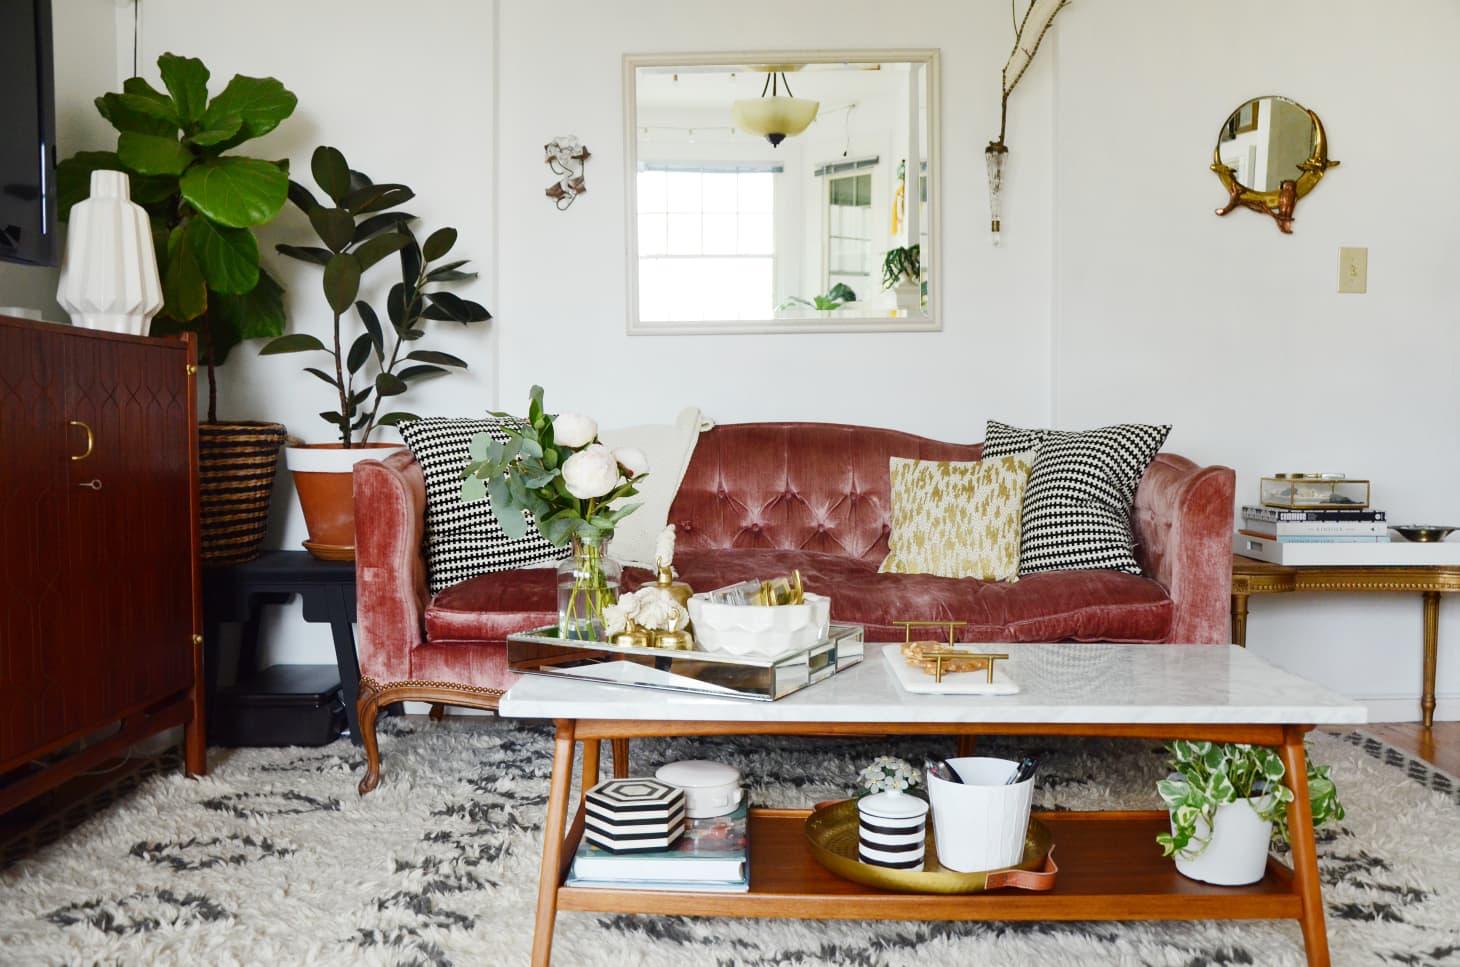 Cozy Design Ideas How To Decorate A Cozy Home Apartment